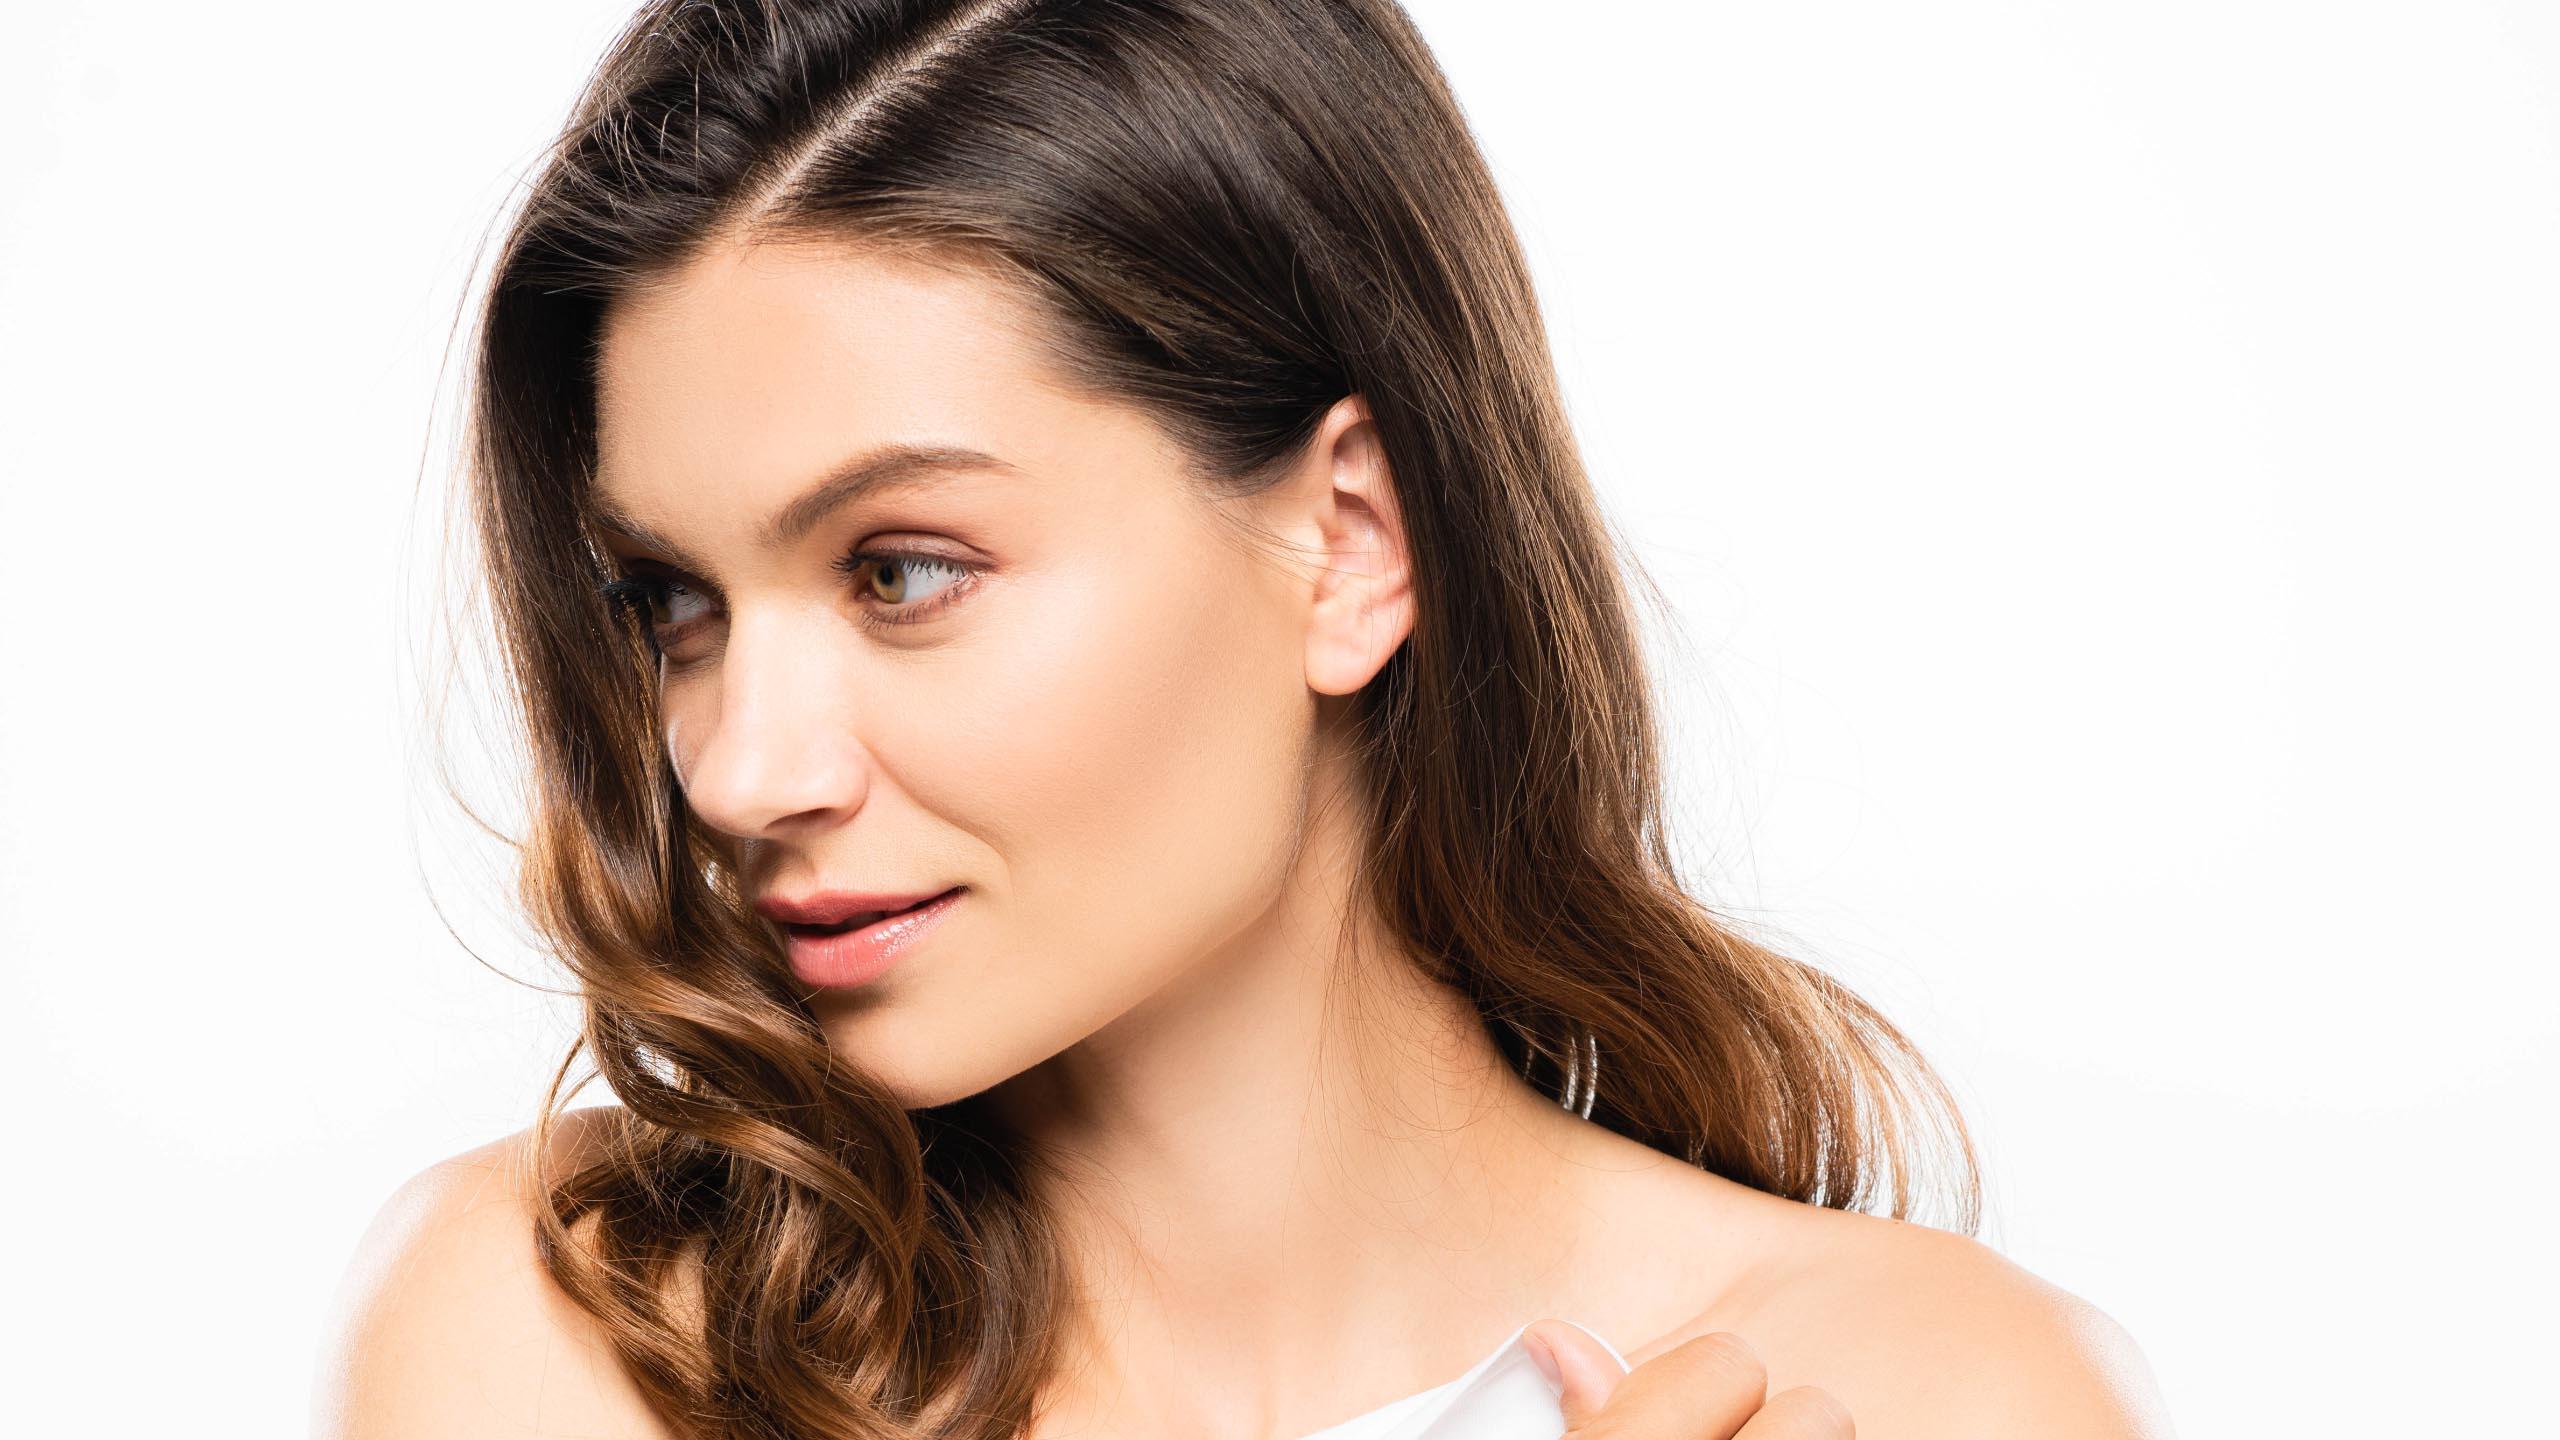 Skin Care AcneTreatment